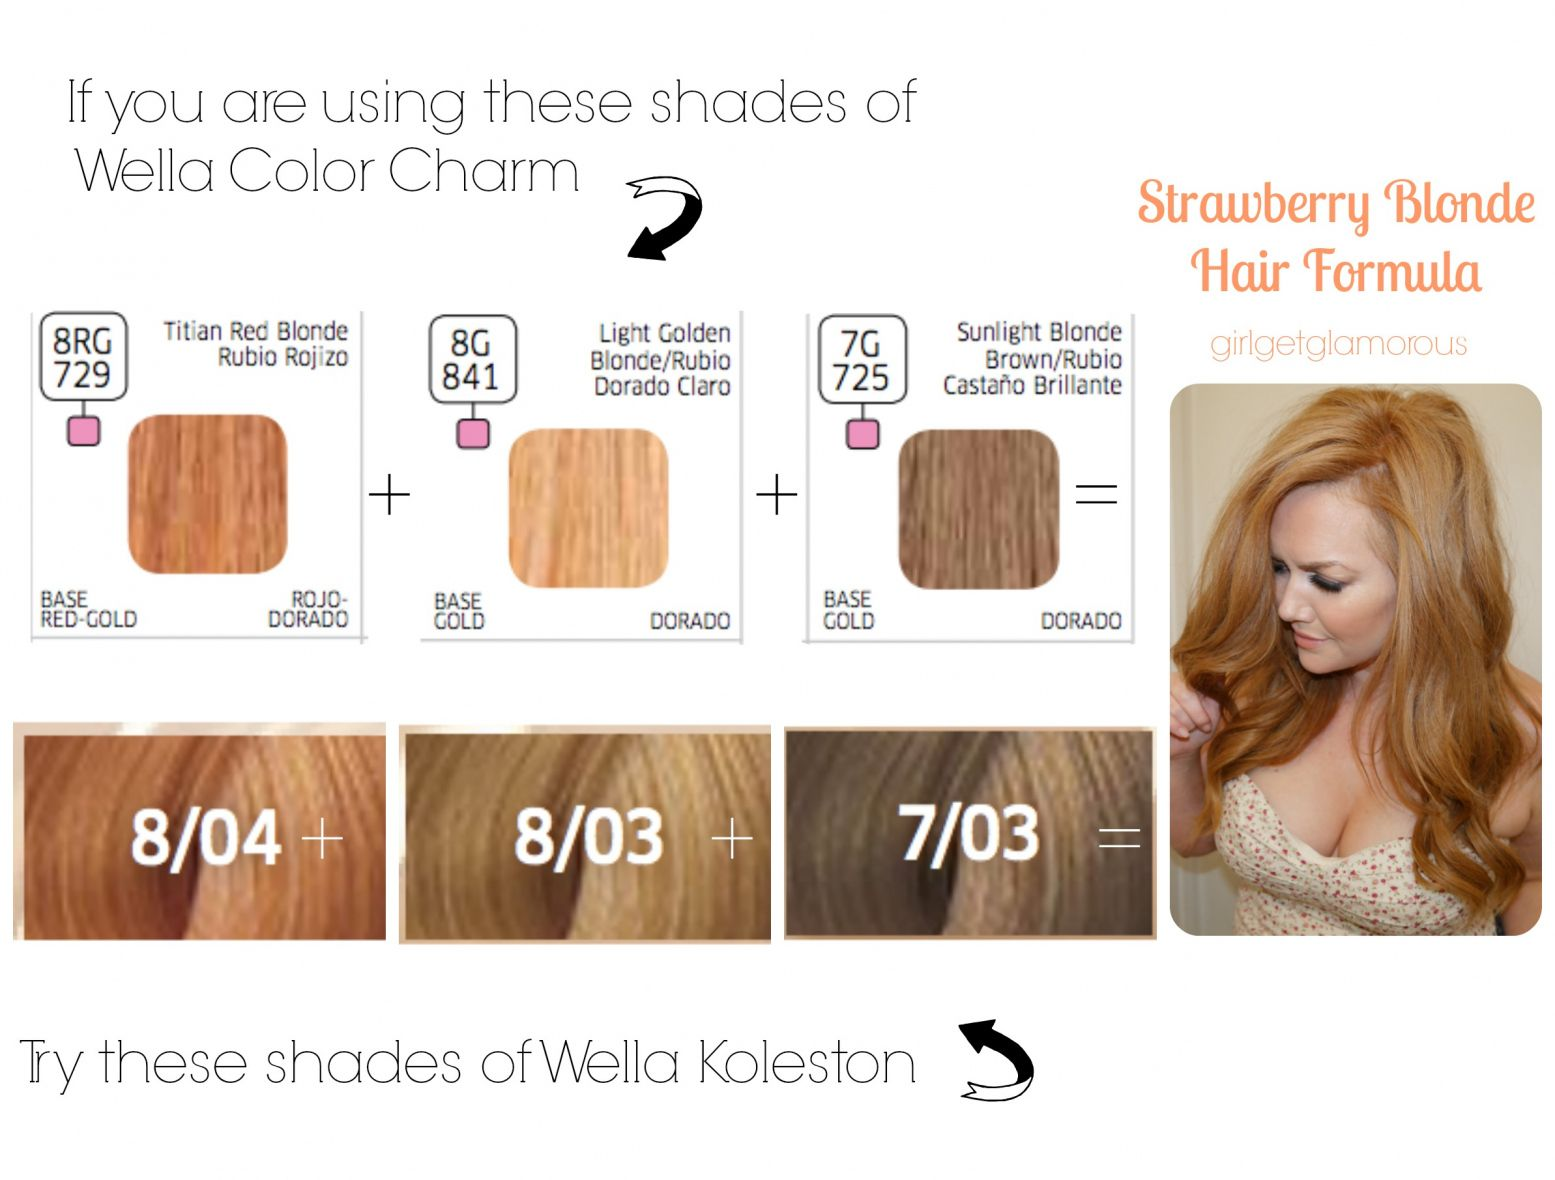 Strawberry blonde hair color formula best at home semi permanent strawberry blonde hair color formula best at home semi permanent hair color check more at nvjuhfo Choice Image